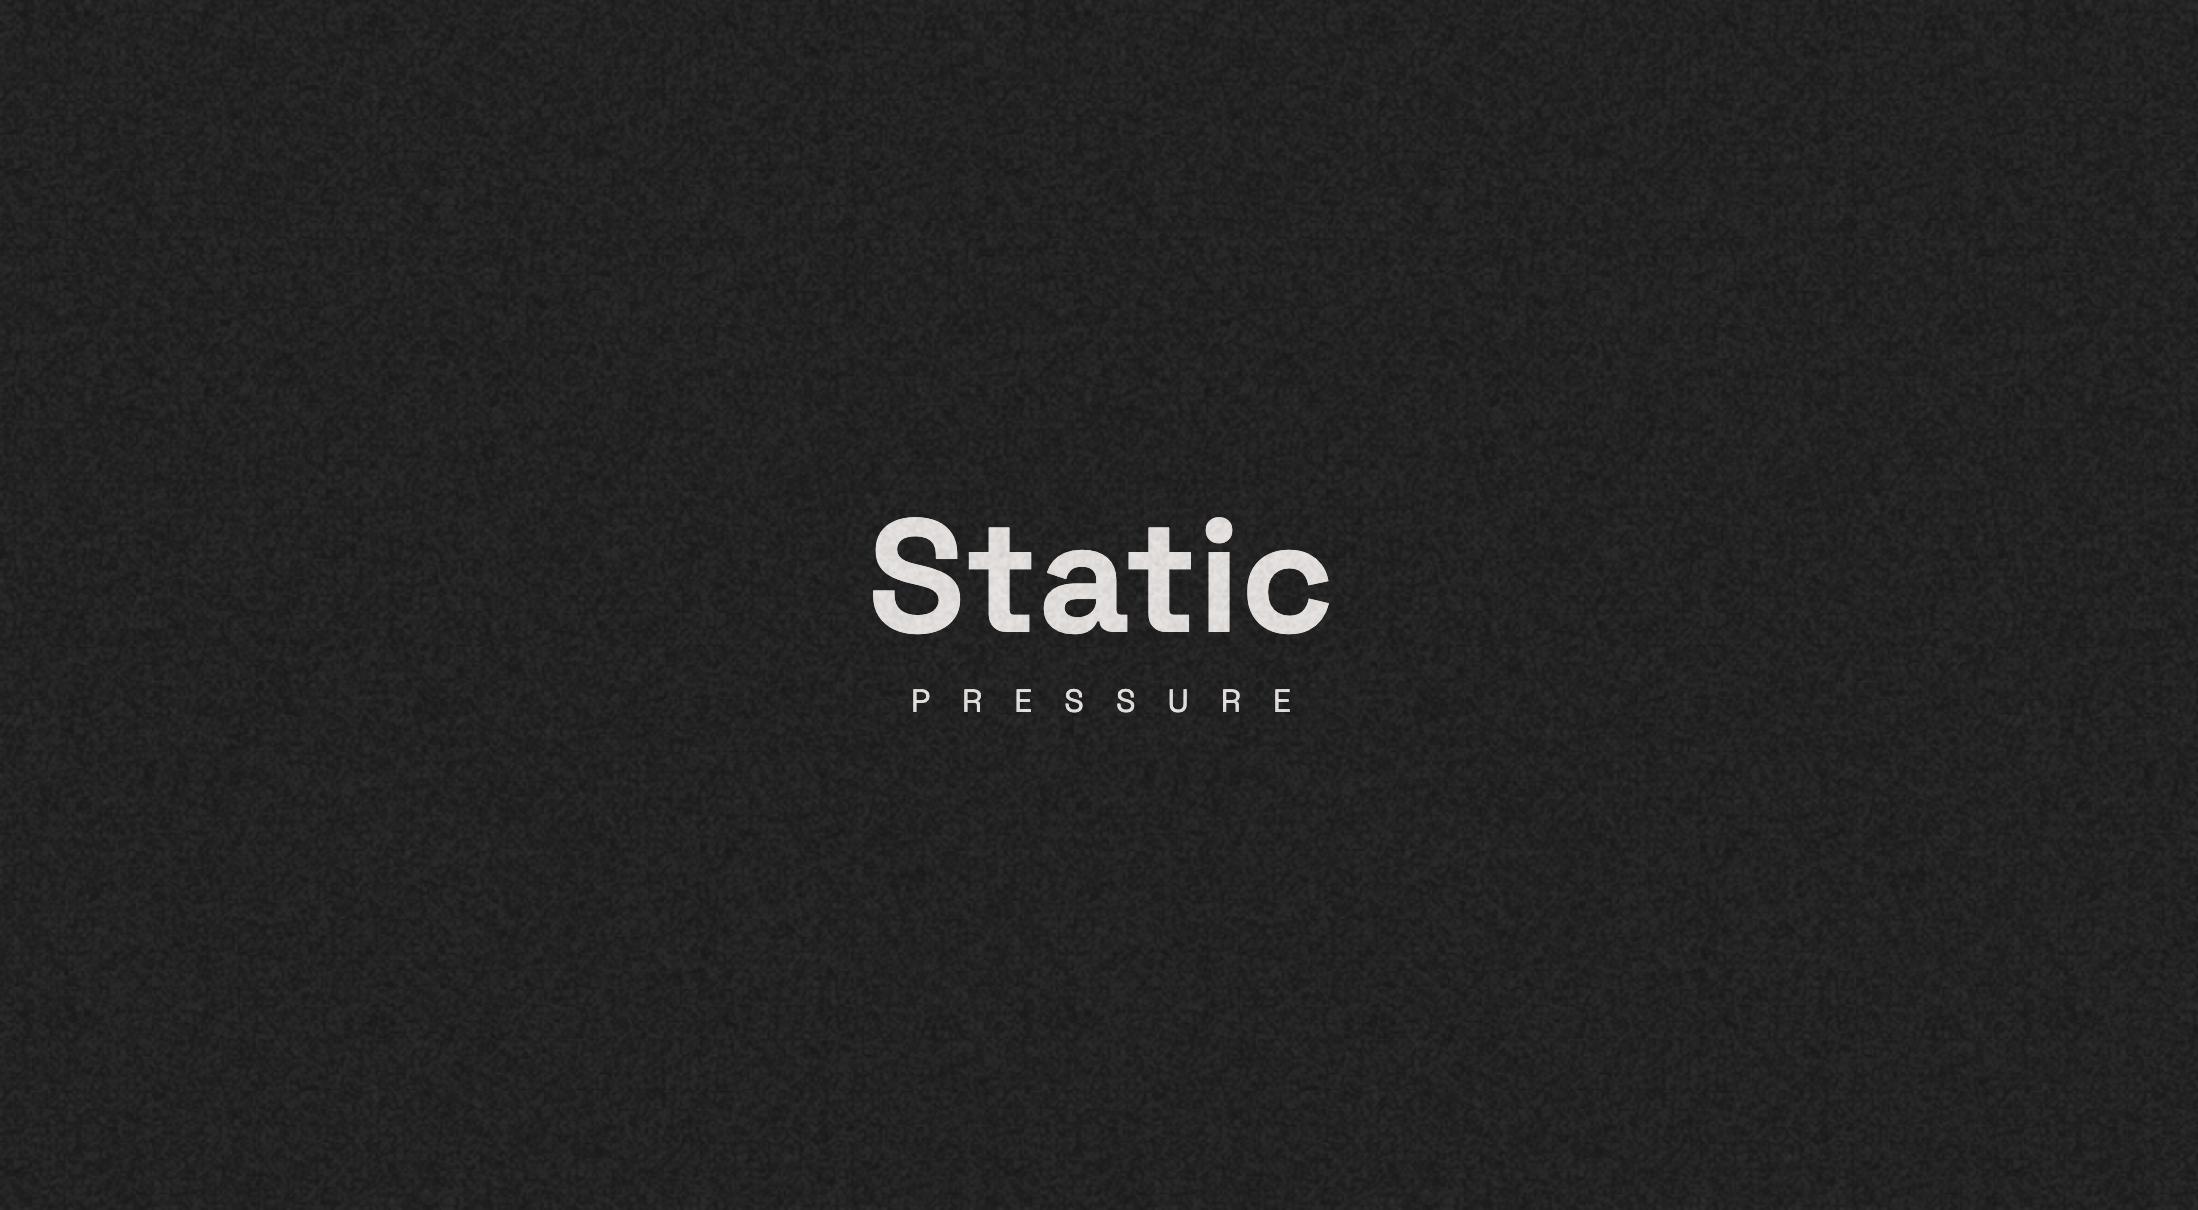 Static Background